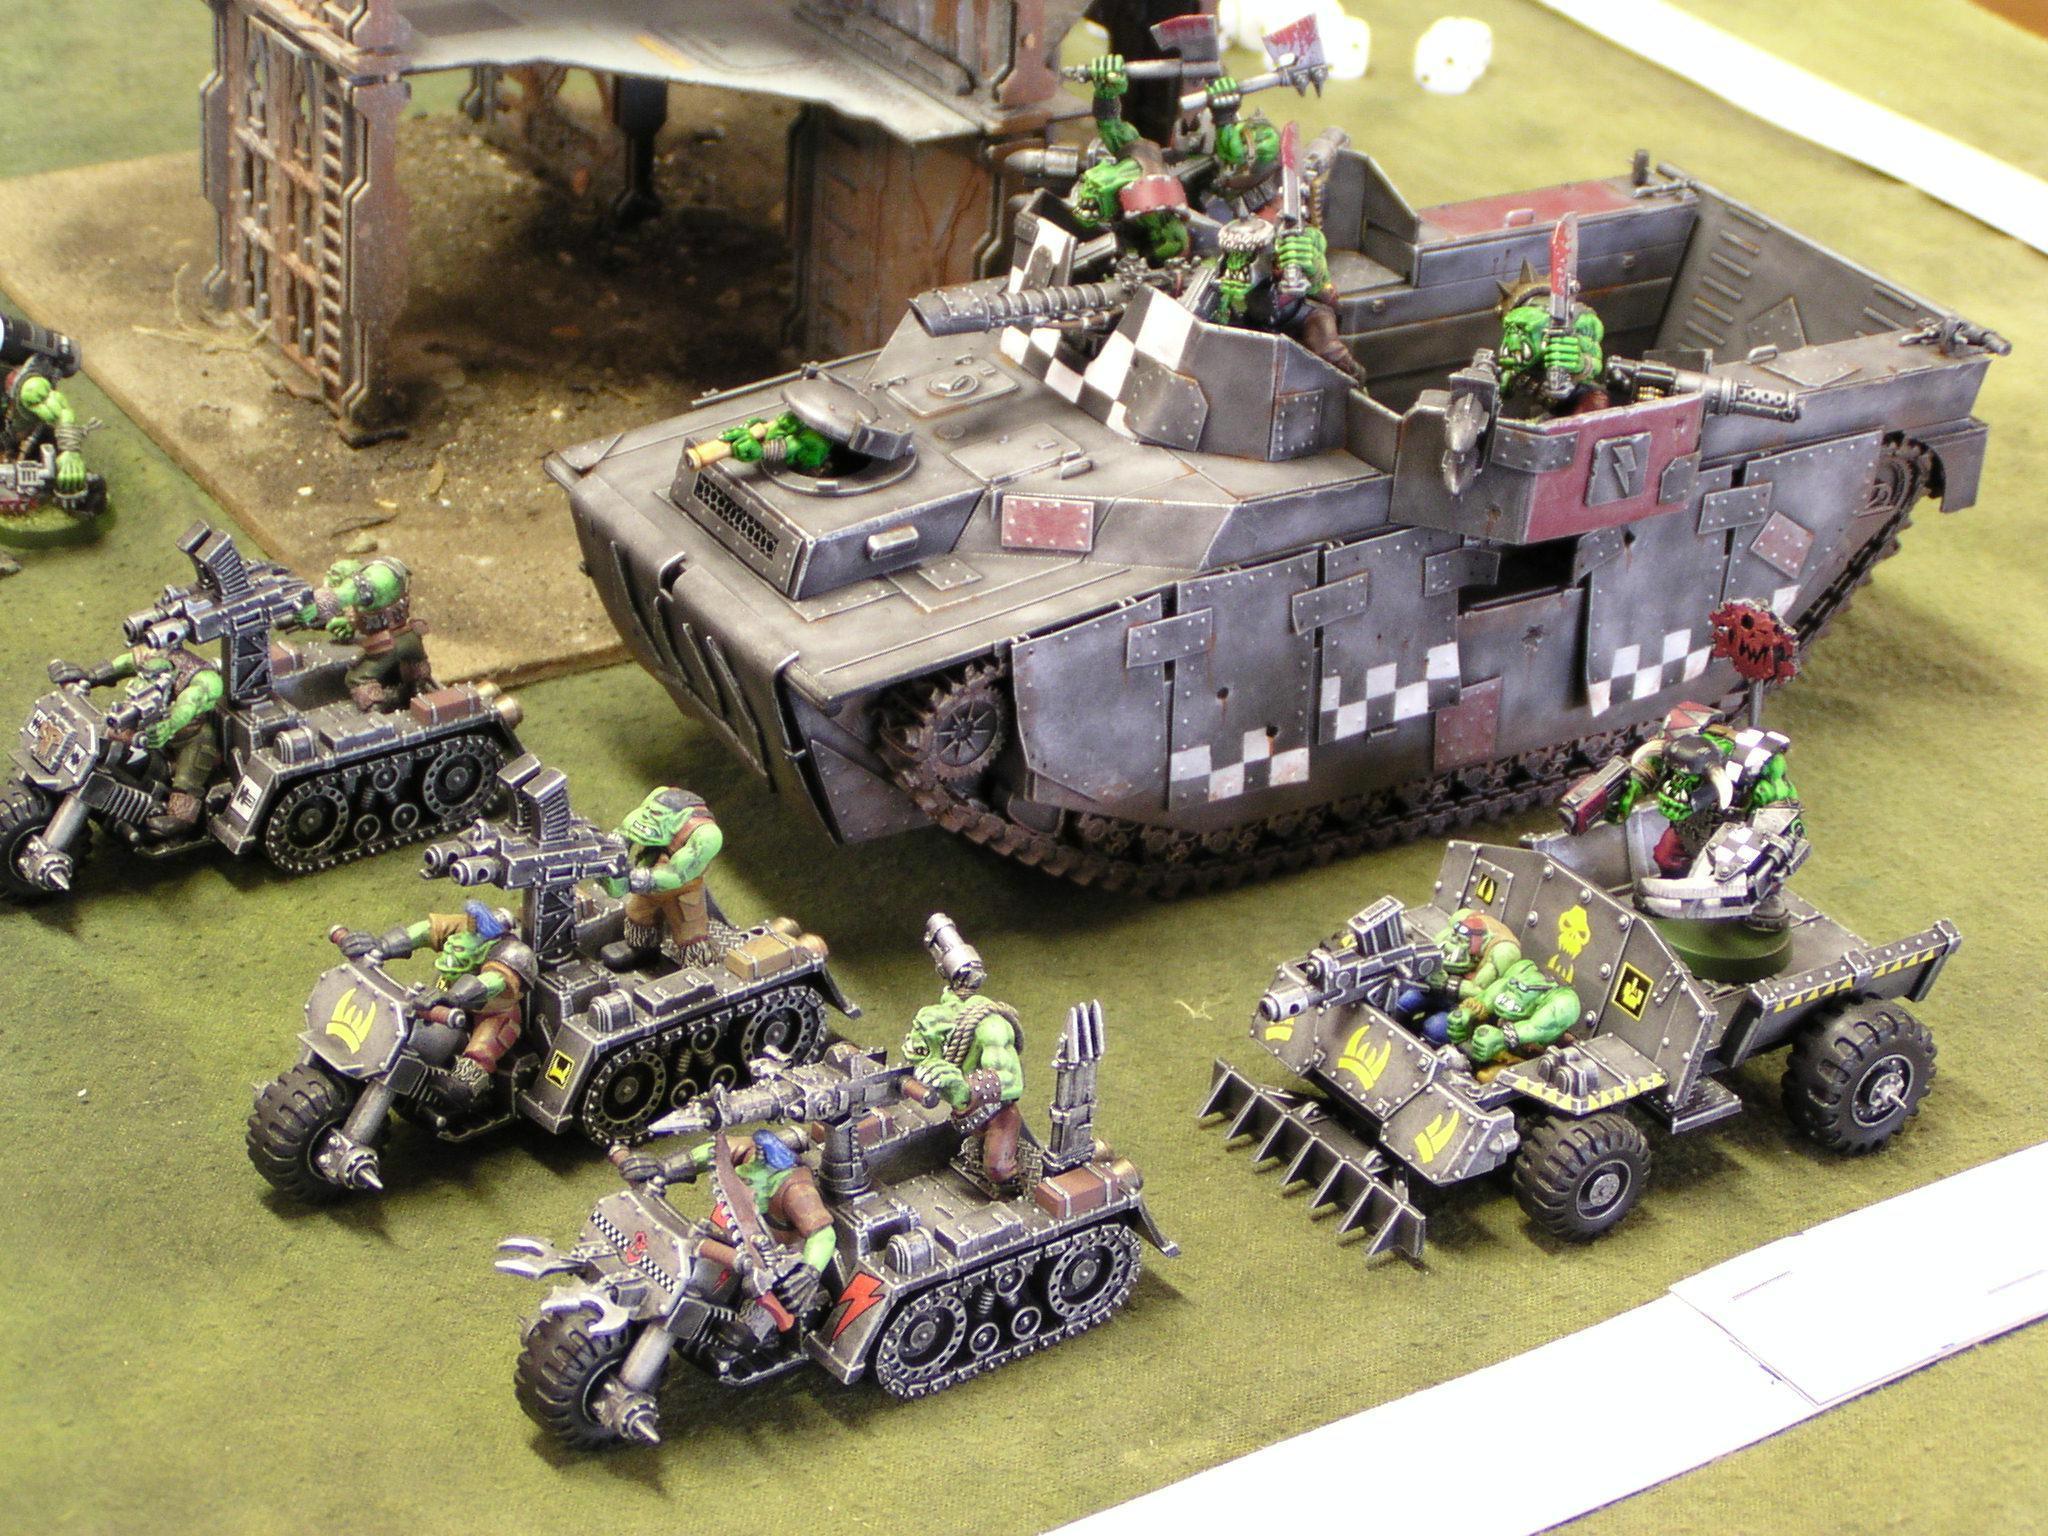 Battlewagon, Conversion, Kitbash, Orks, Vehicle, Warbuggy, Warhammer 40,000, Wartrukk